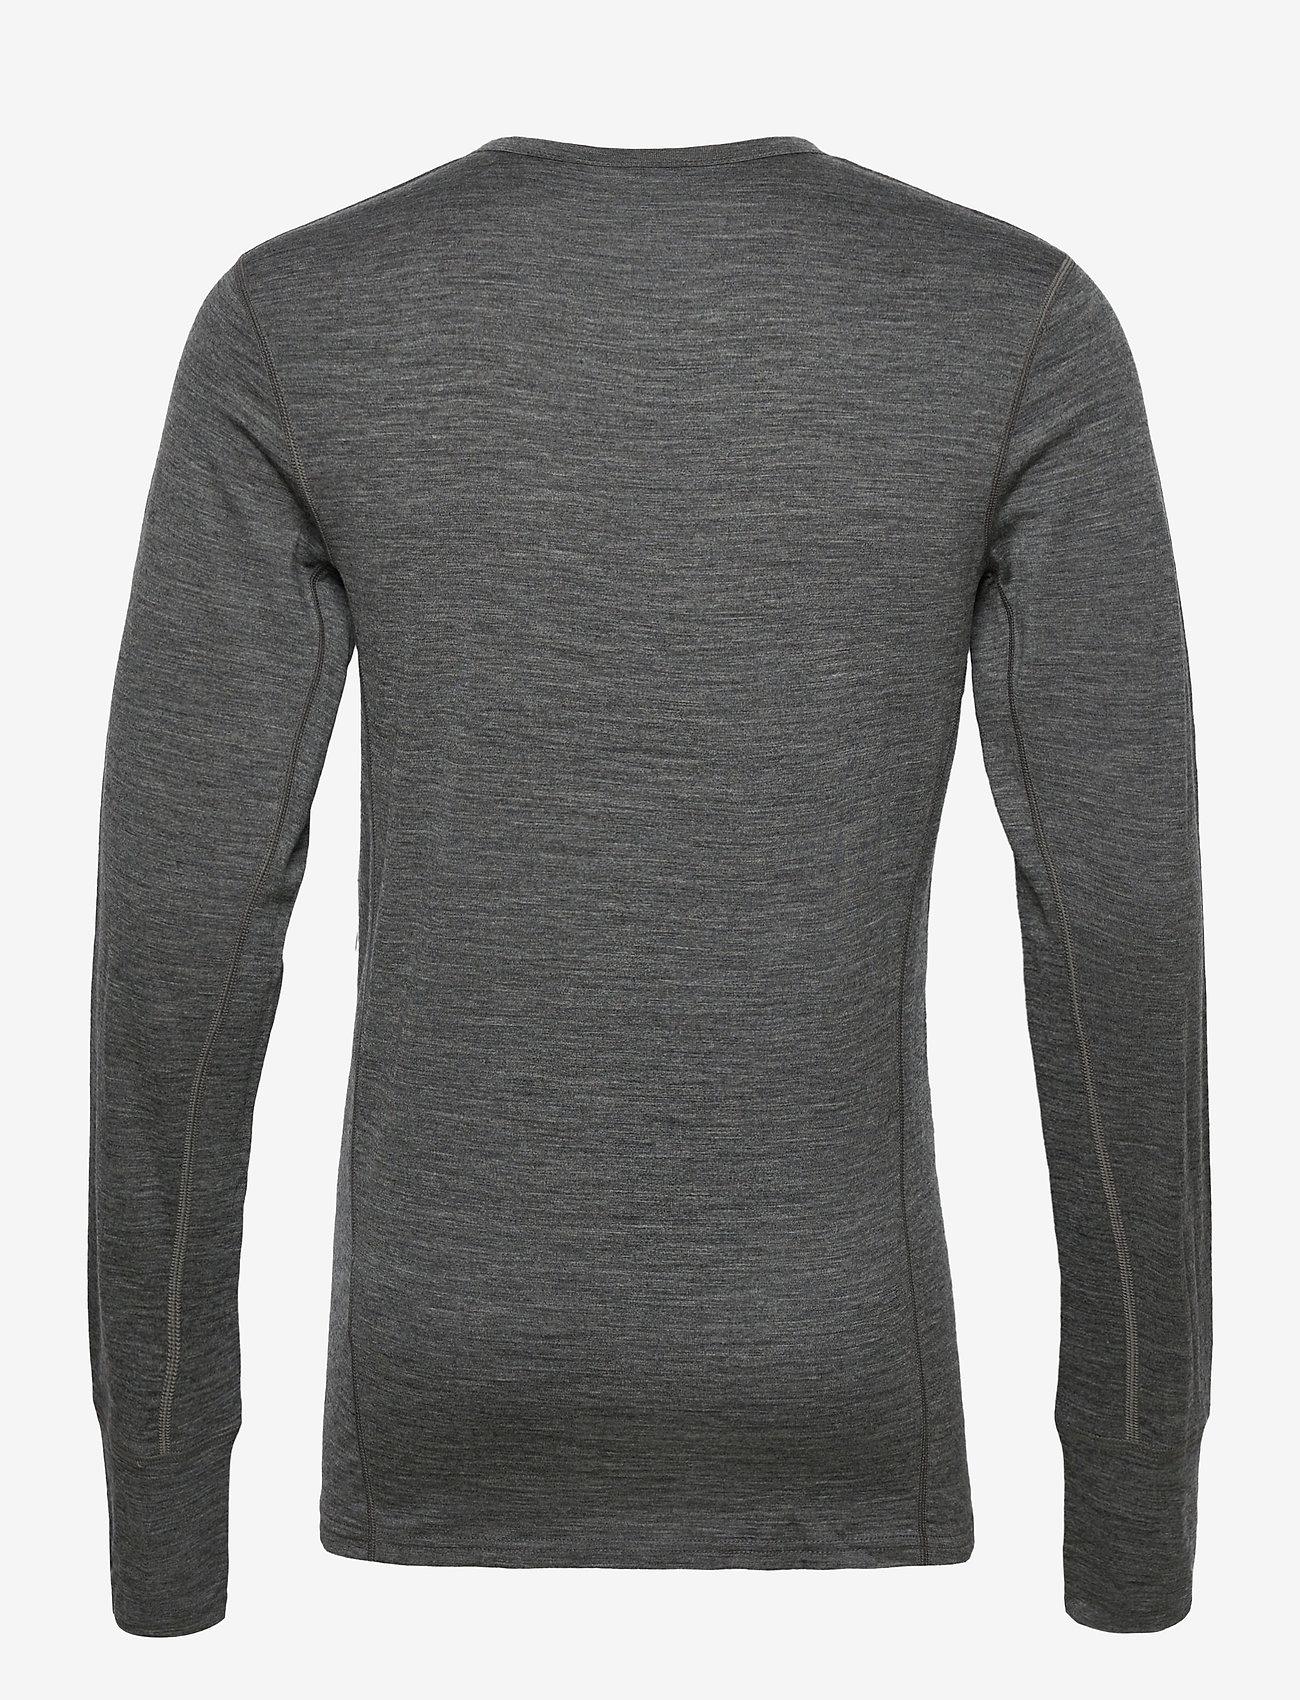 Skogstad - Leknes merino wool sweater - basic strik - mid grey melange - 1